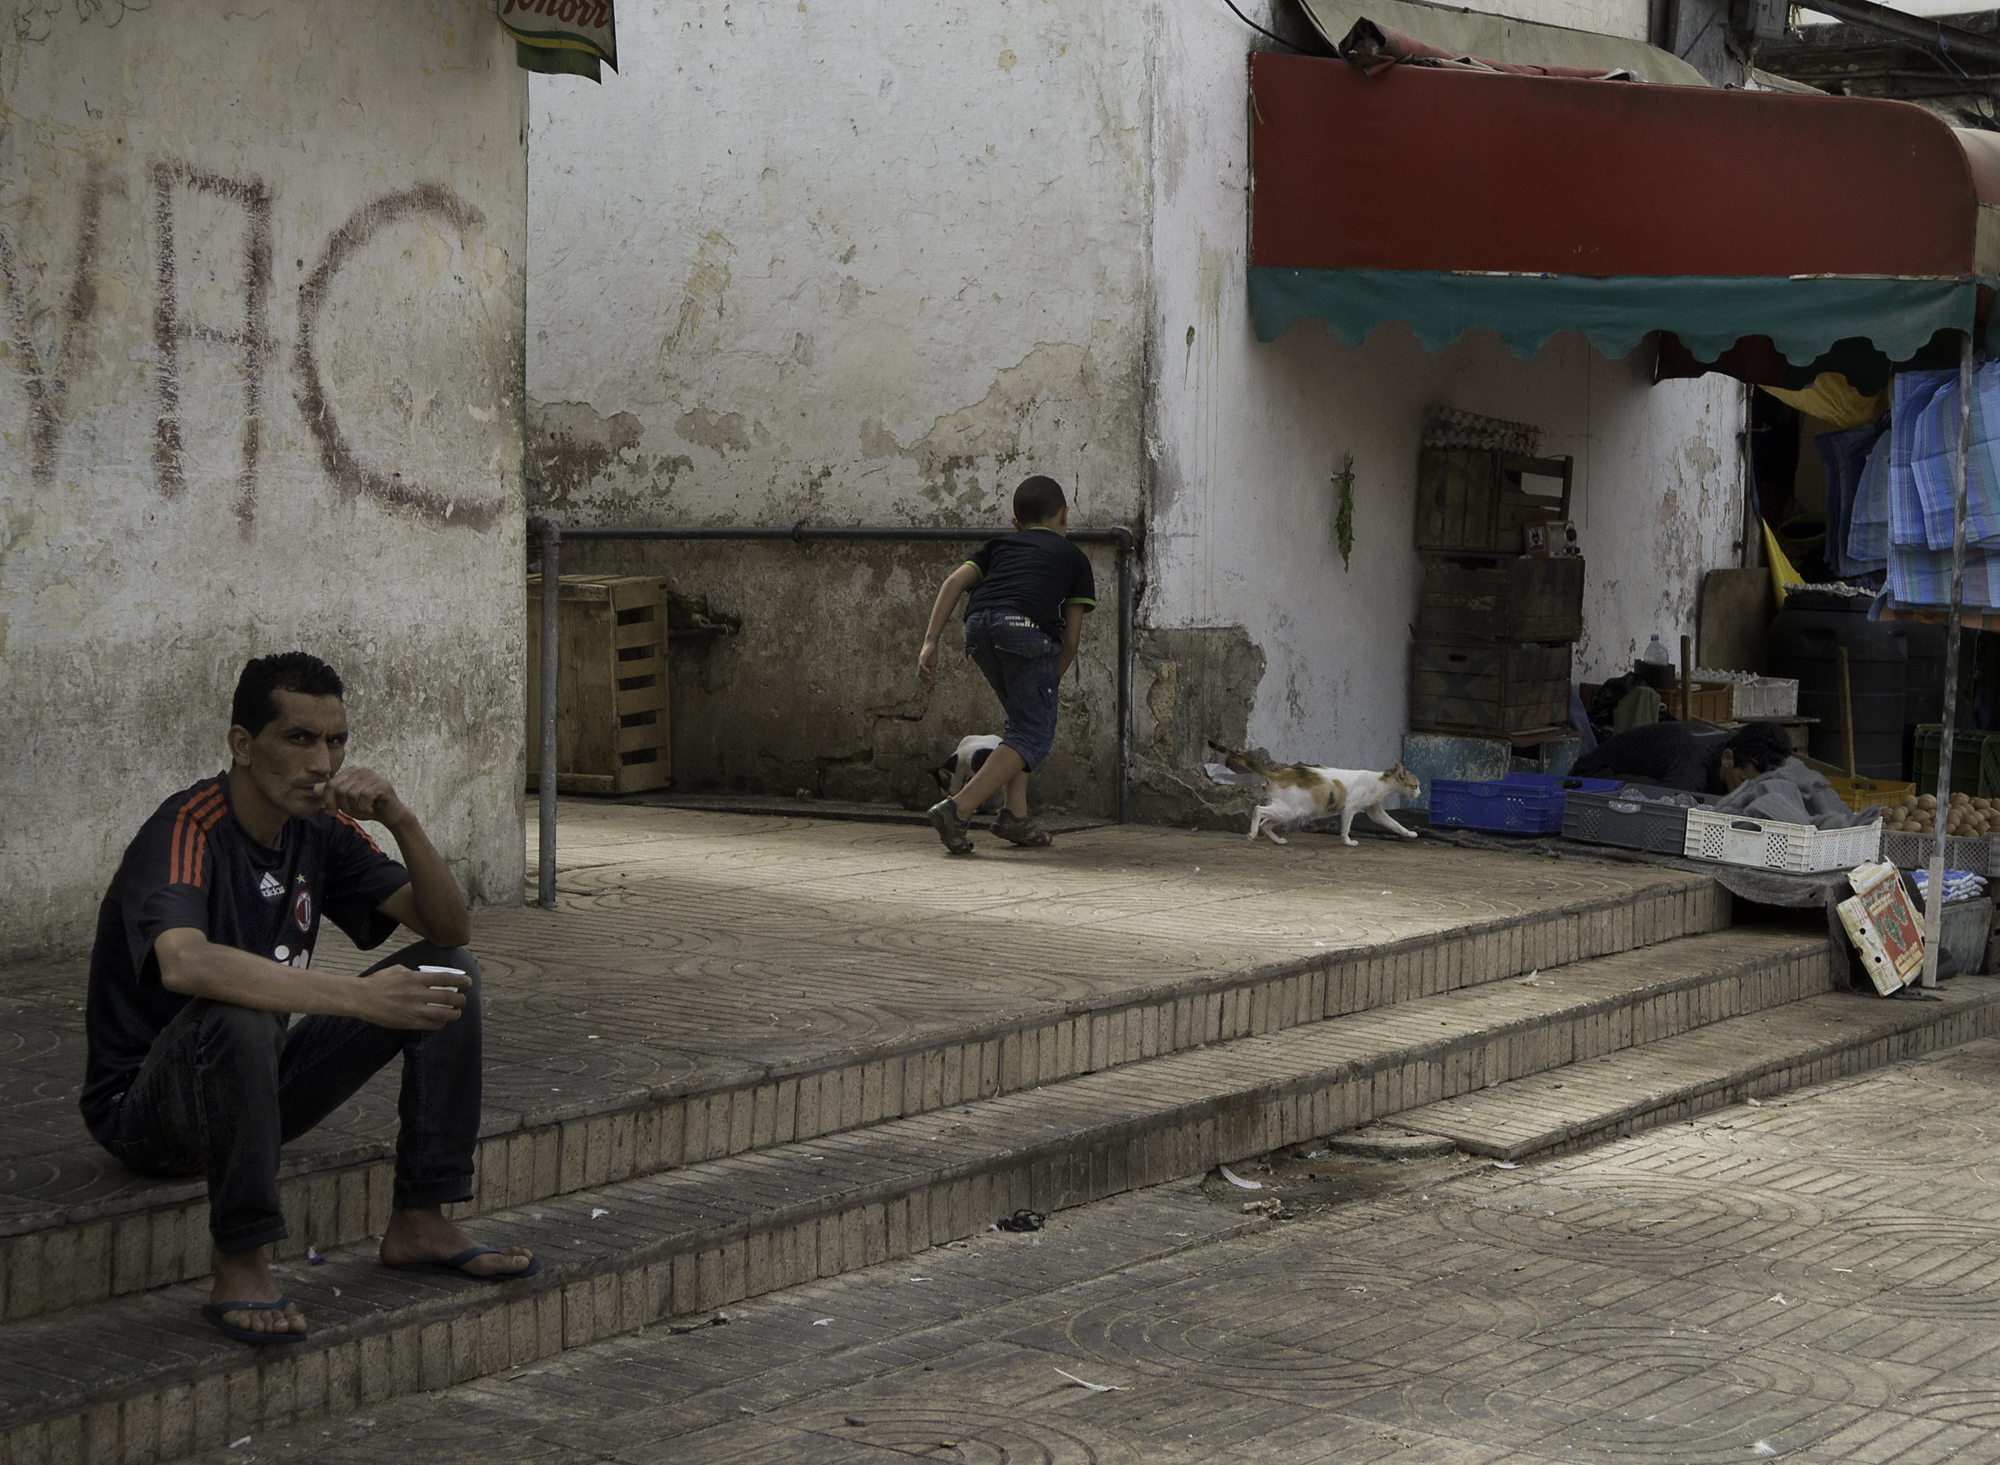 Maroc-6.jpg